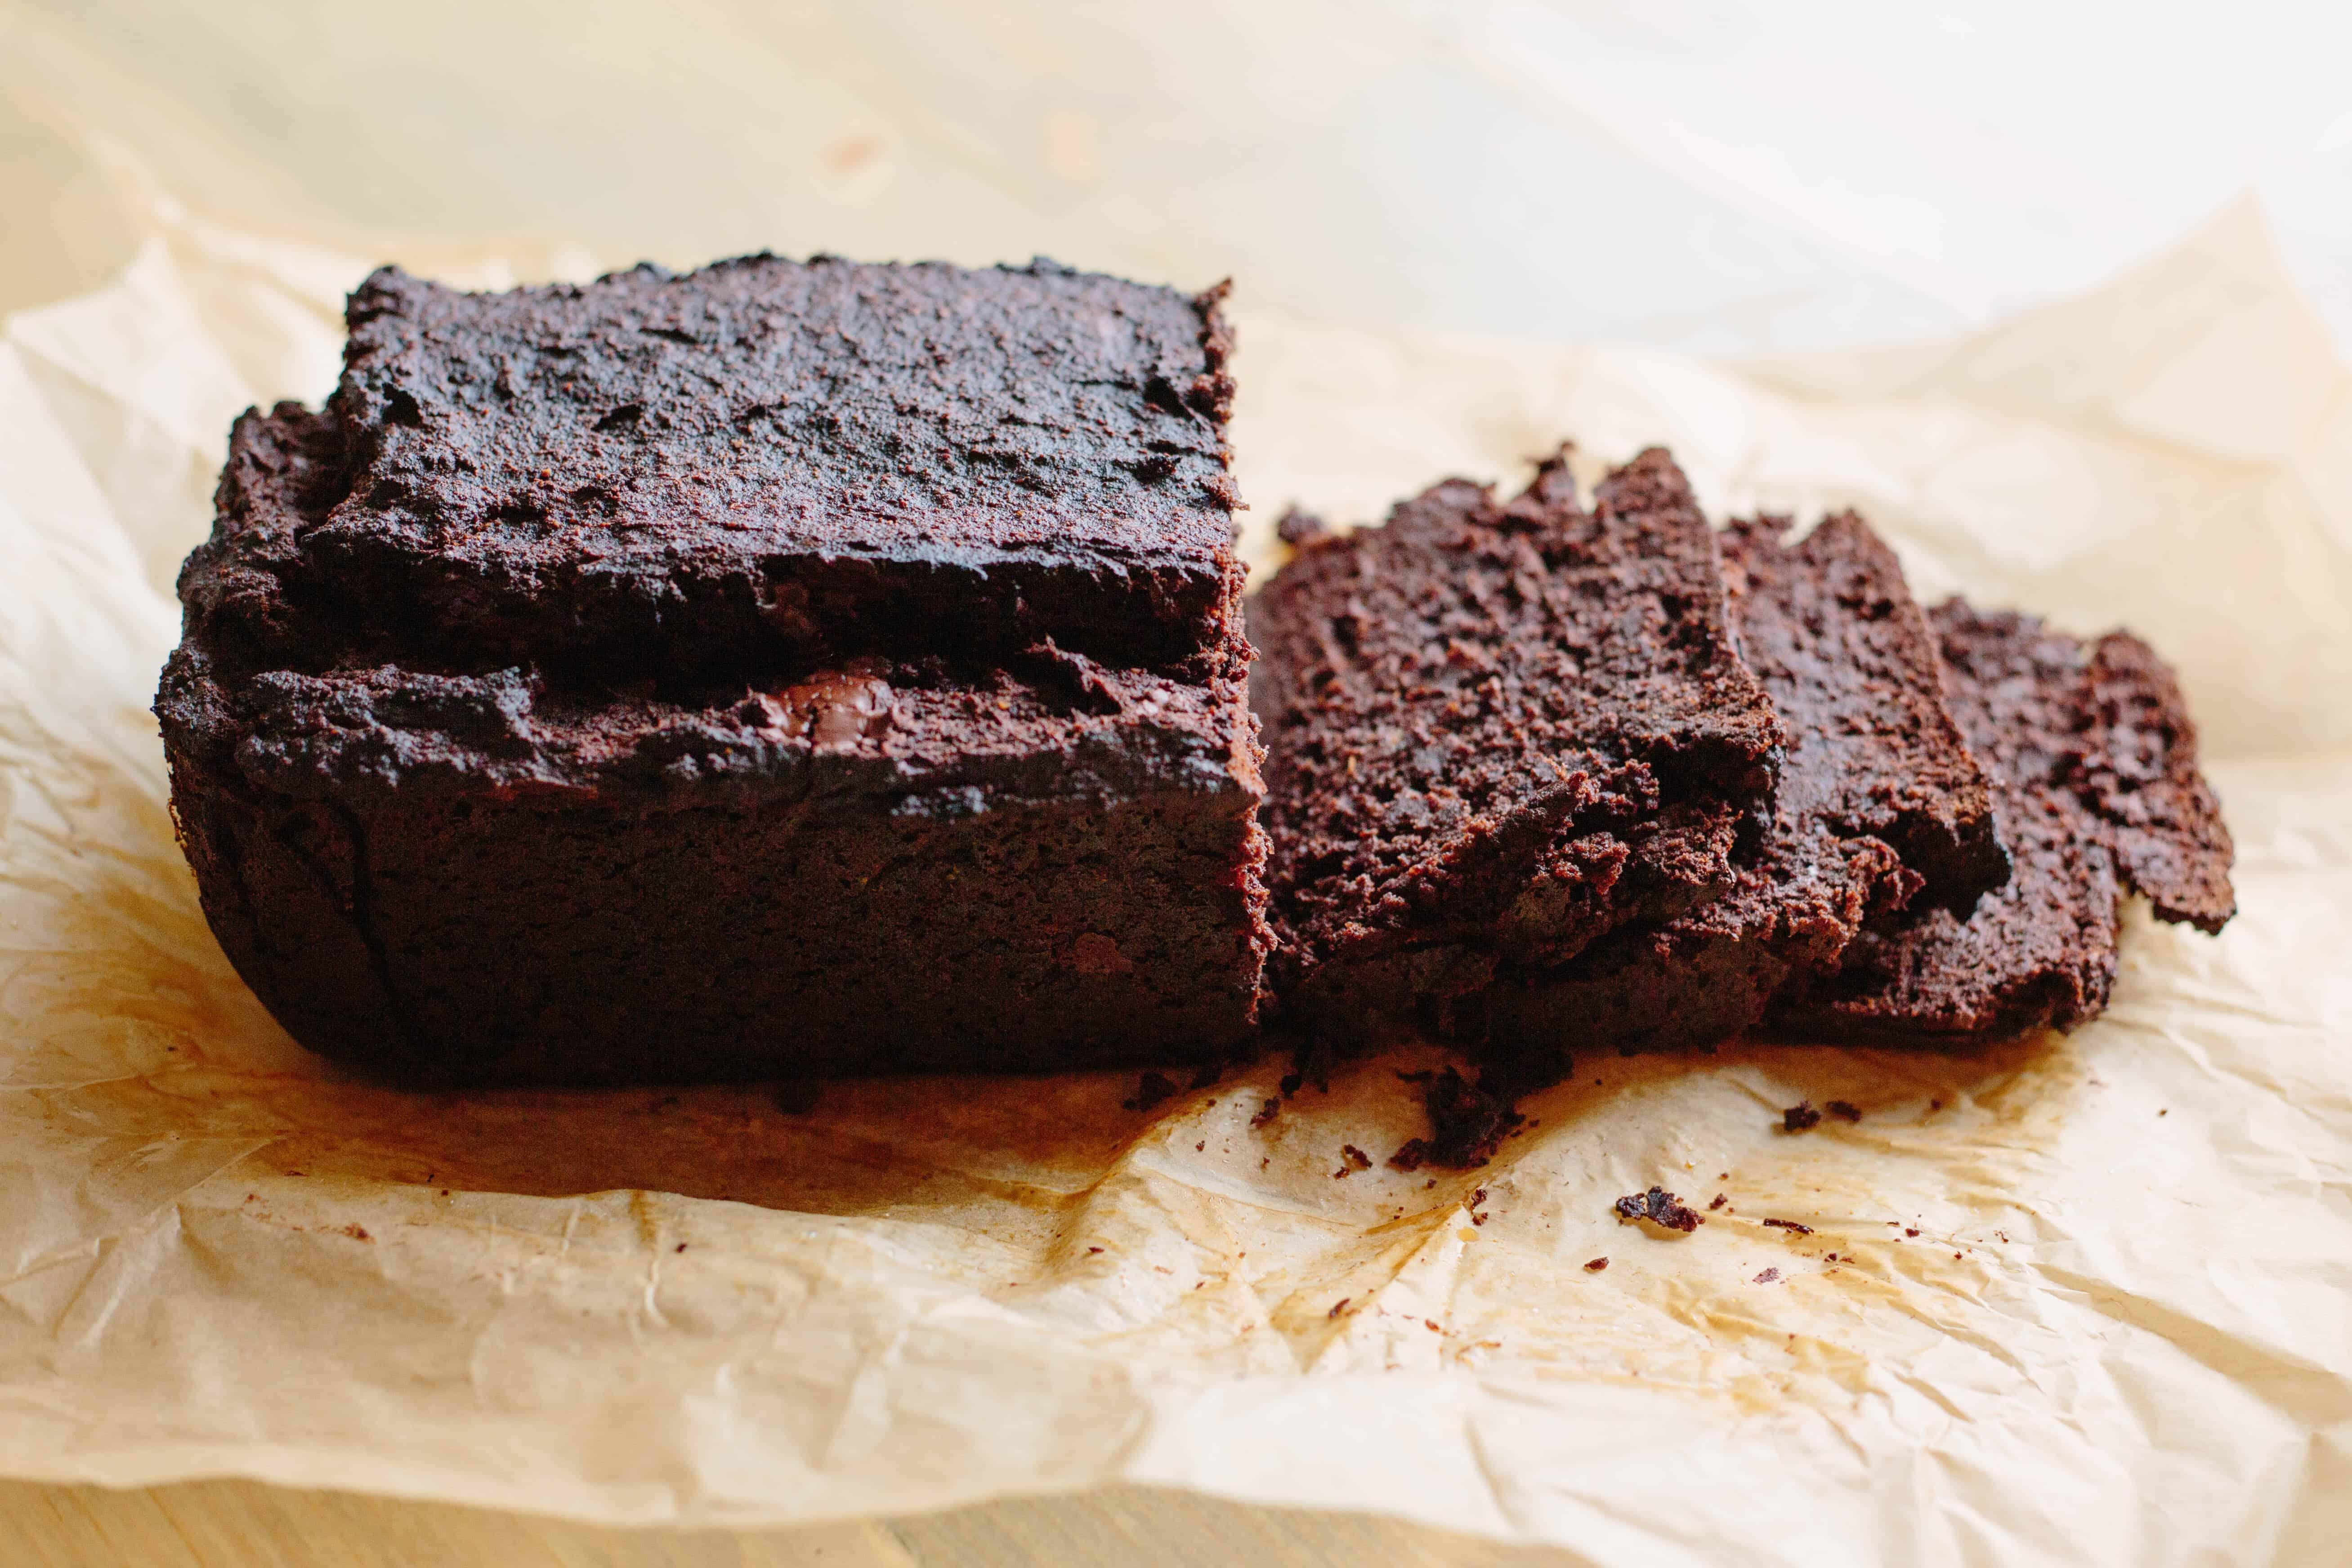 DOUBLE CHOCOLATE PALEO BANANA BREAD | Dairy, Grain, + Refined Sugar Free, but it tastes like chocolate cake! | ColeyCooks.com